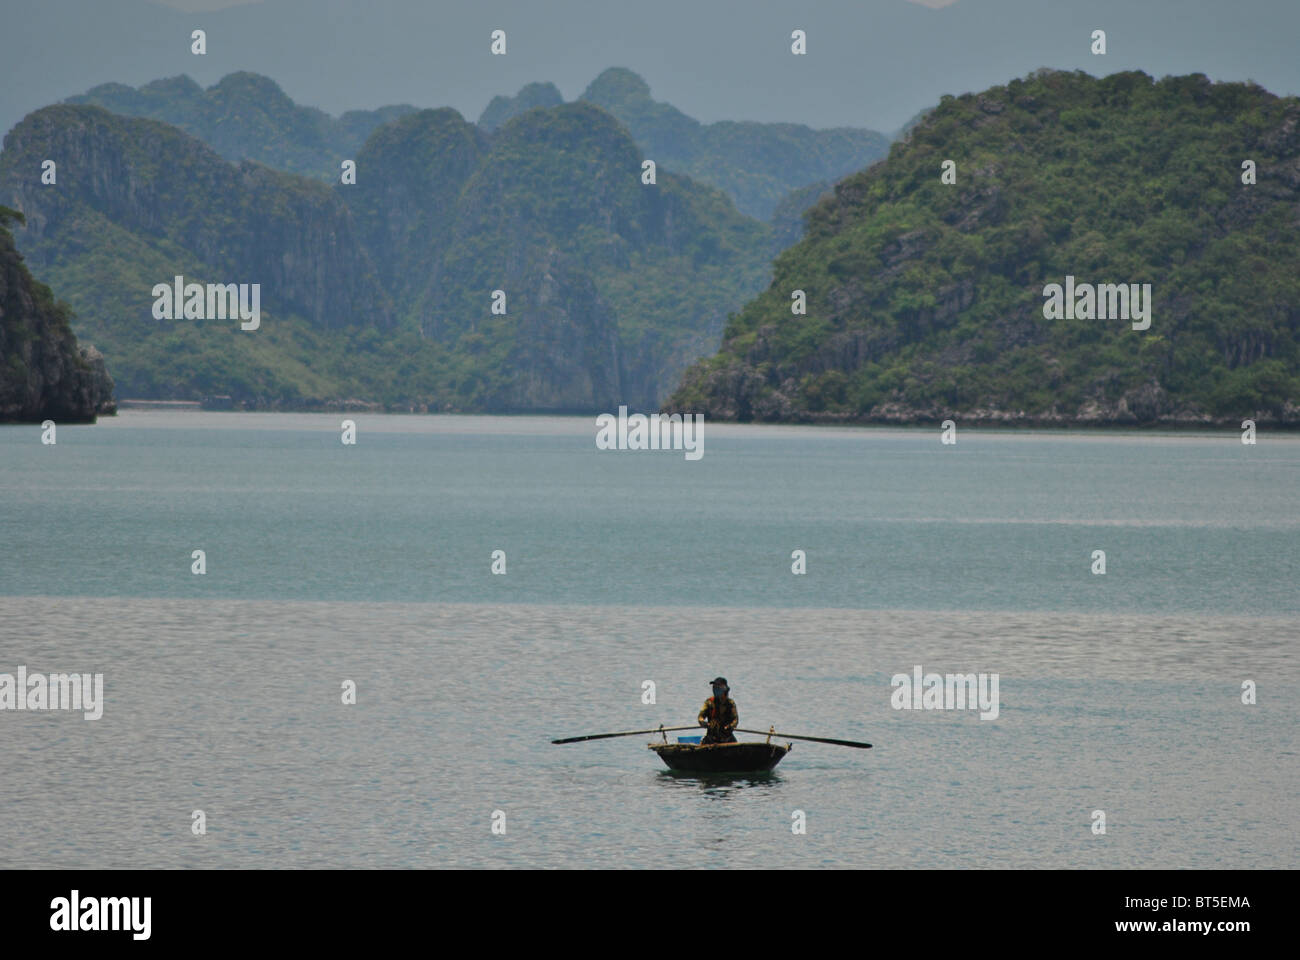 Man rowing boat in Halong Bay, Vietnam - Stock Image